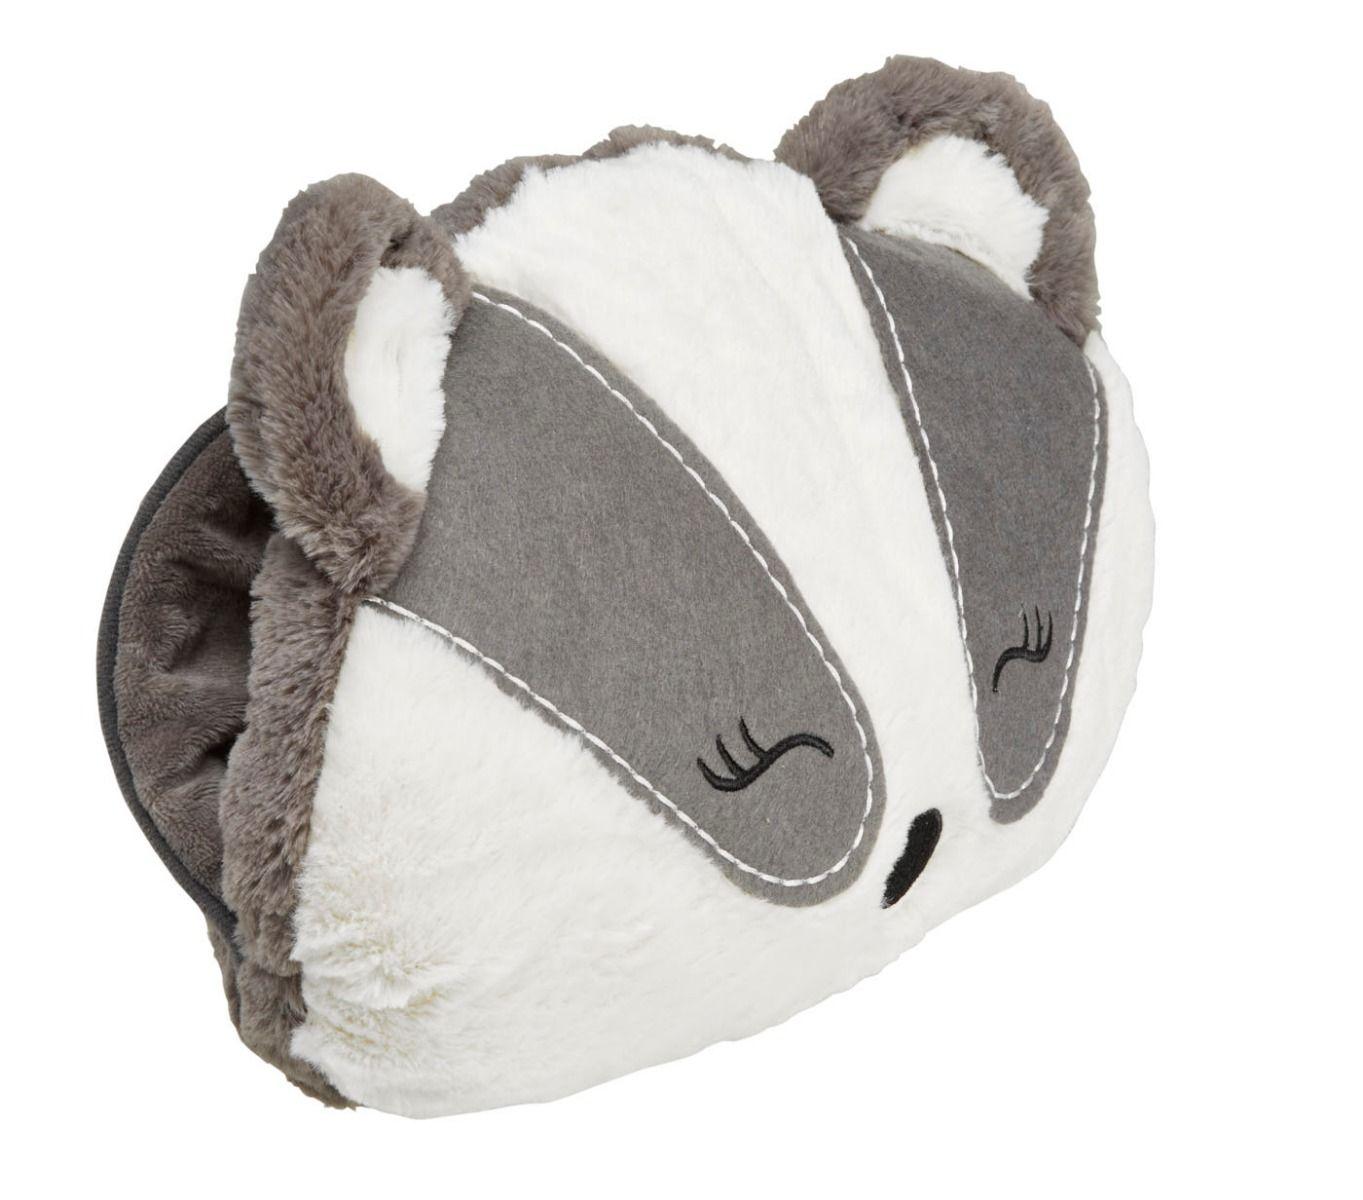 Cosy Heath Up Hand Muff - Badger